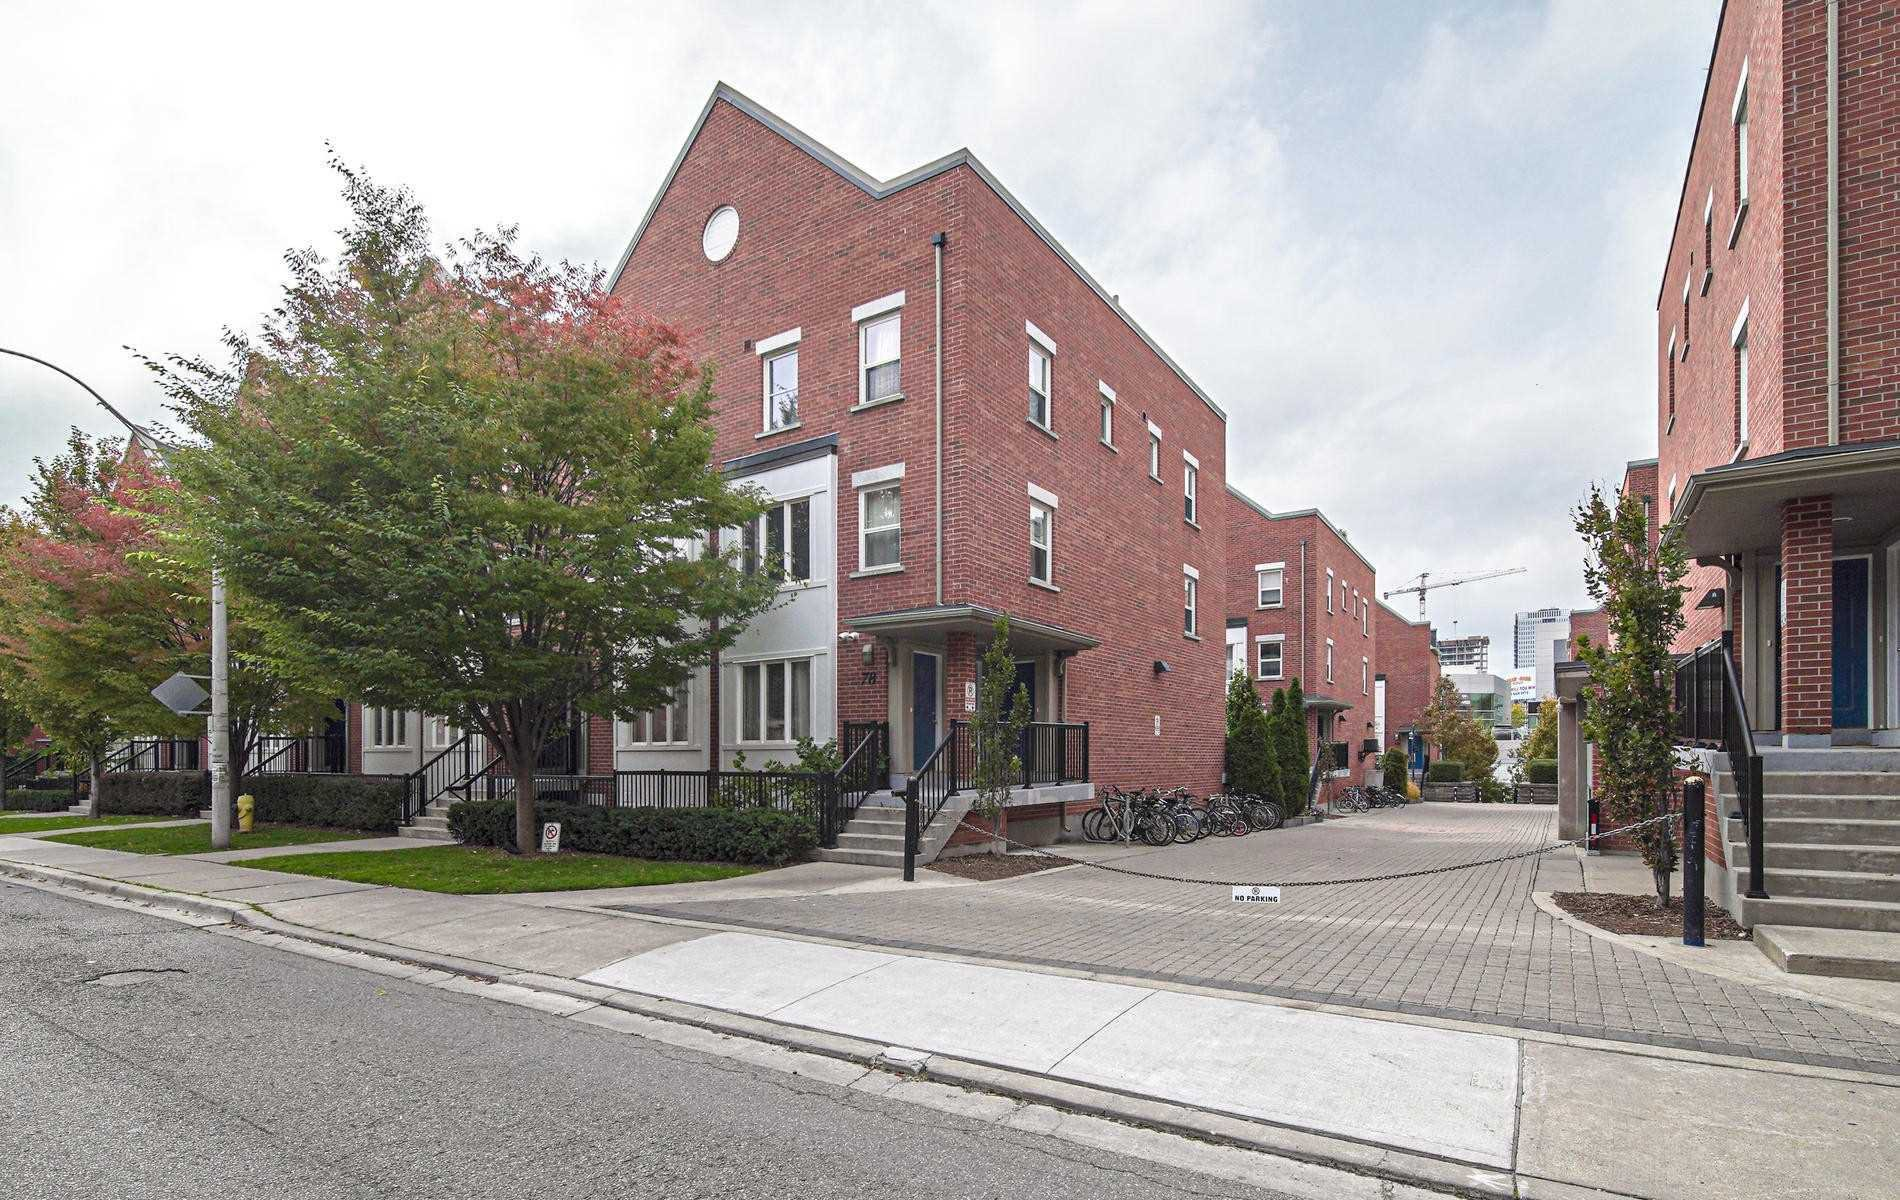 Photo 16: Photos: 3 78 Munro Street in Toronto: South Riverdale Condo for sale (Toronto E01)  : MLS®# E4615987